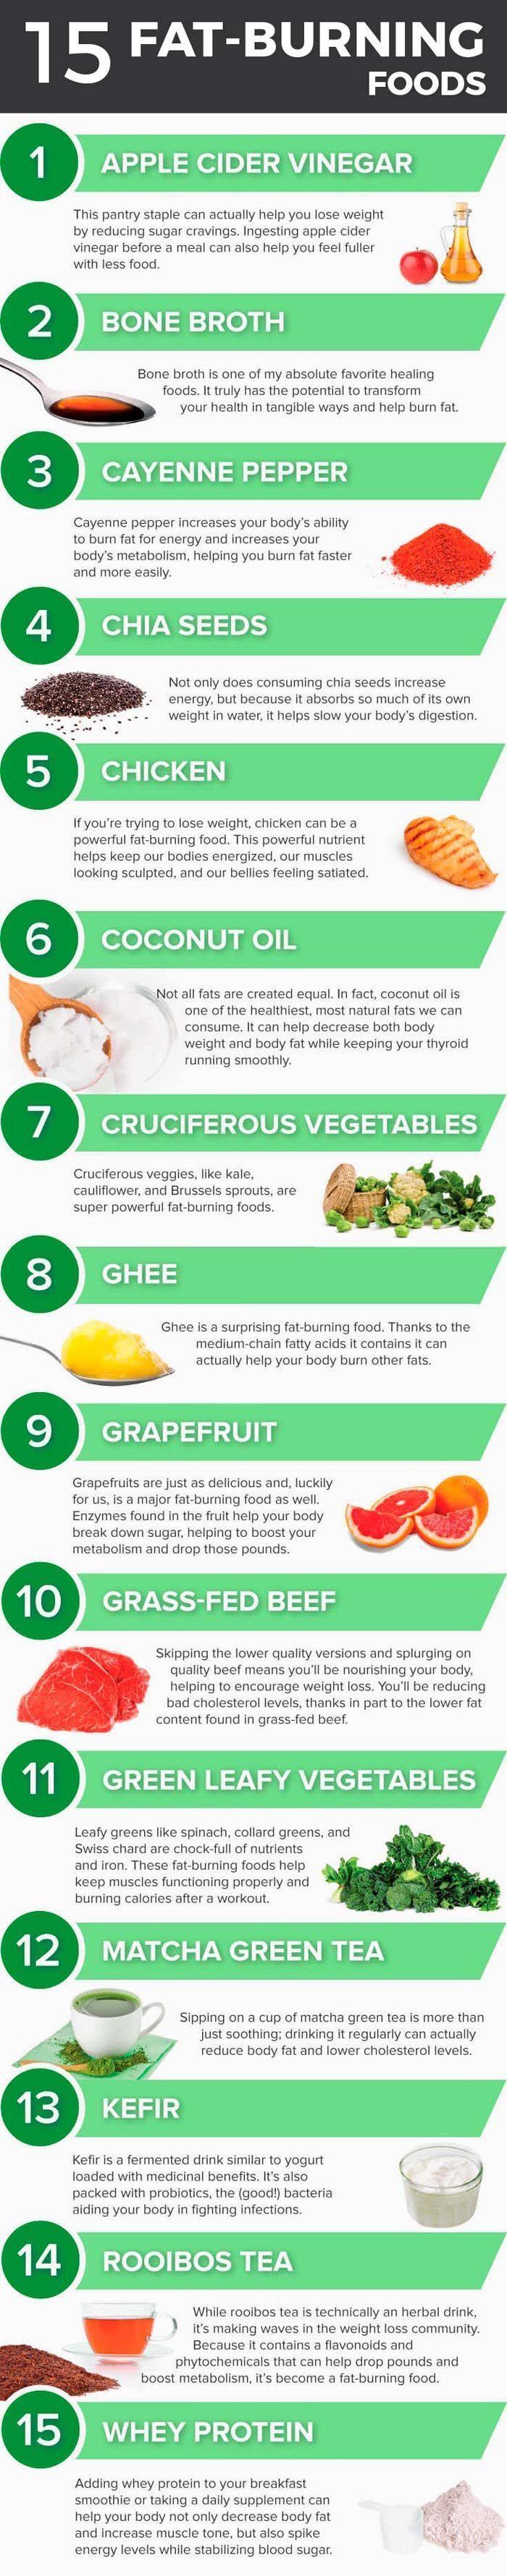 Best fat-burning foods. 15 fat burning foods